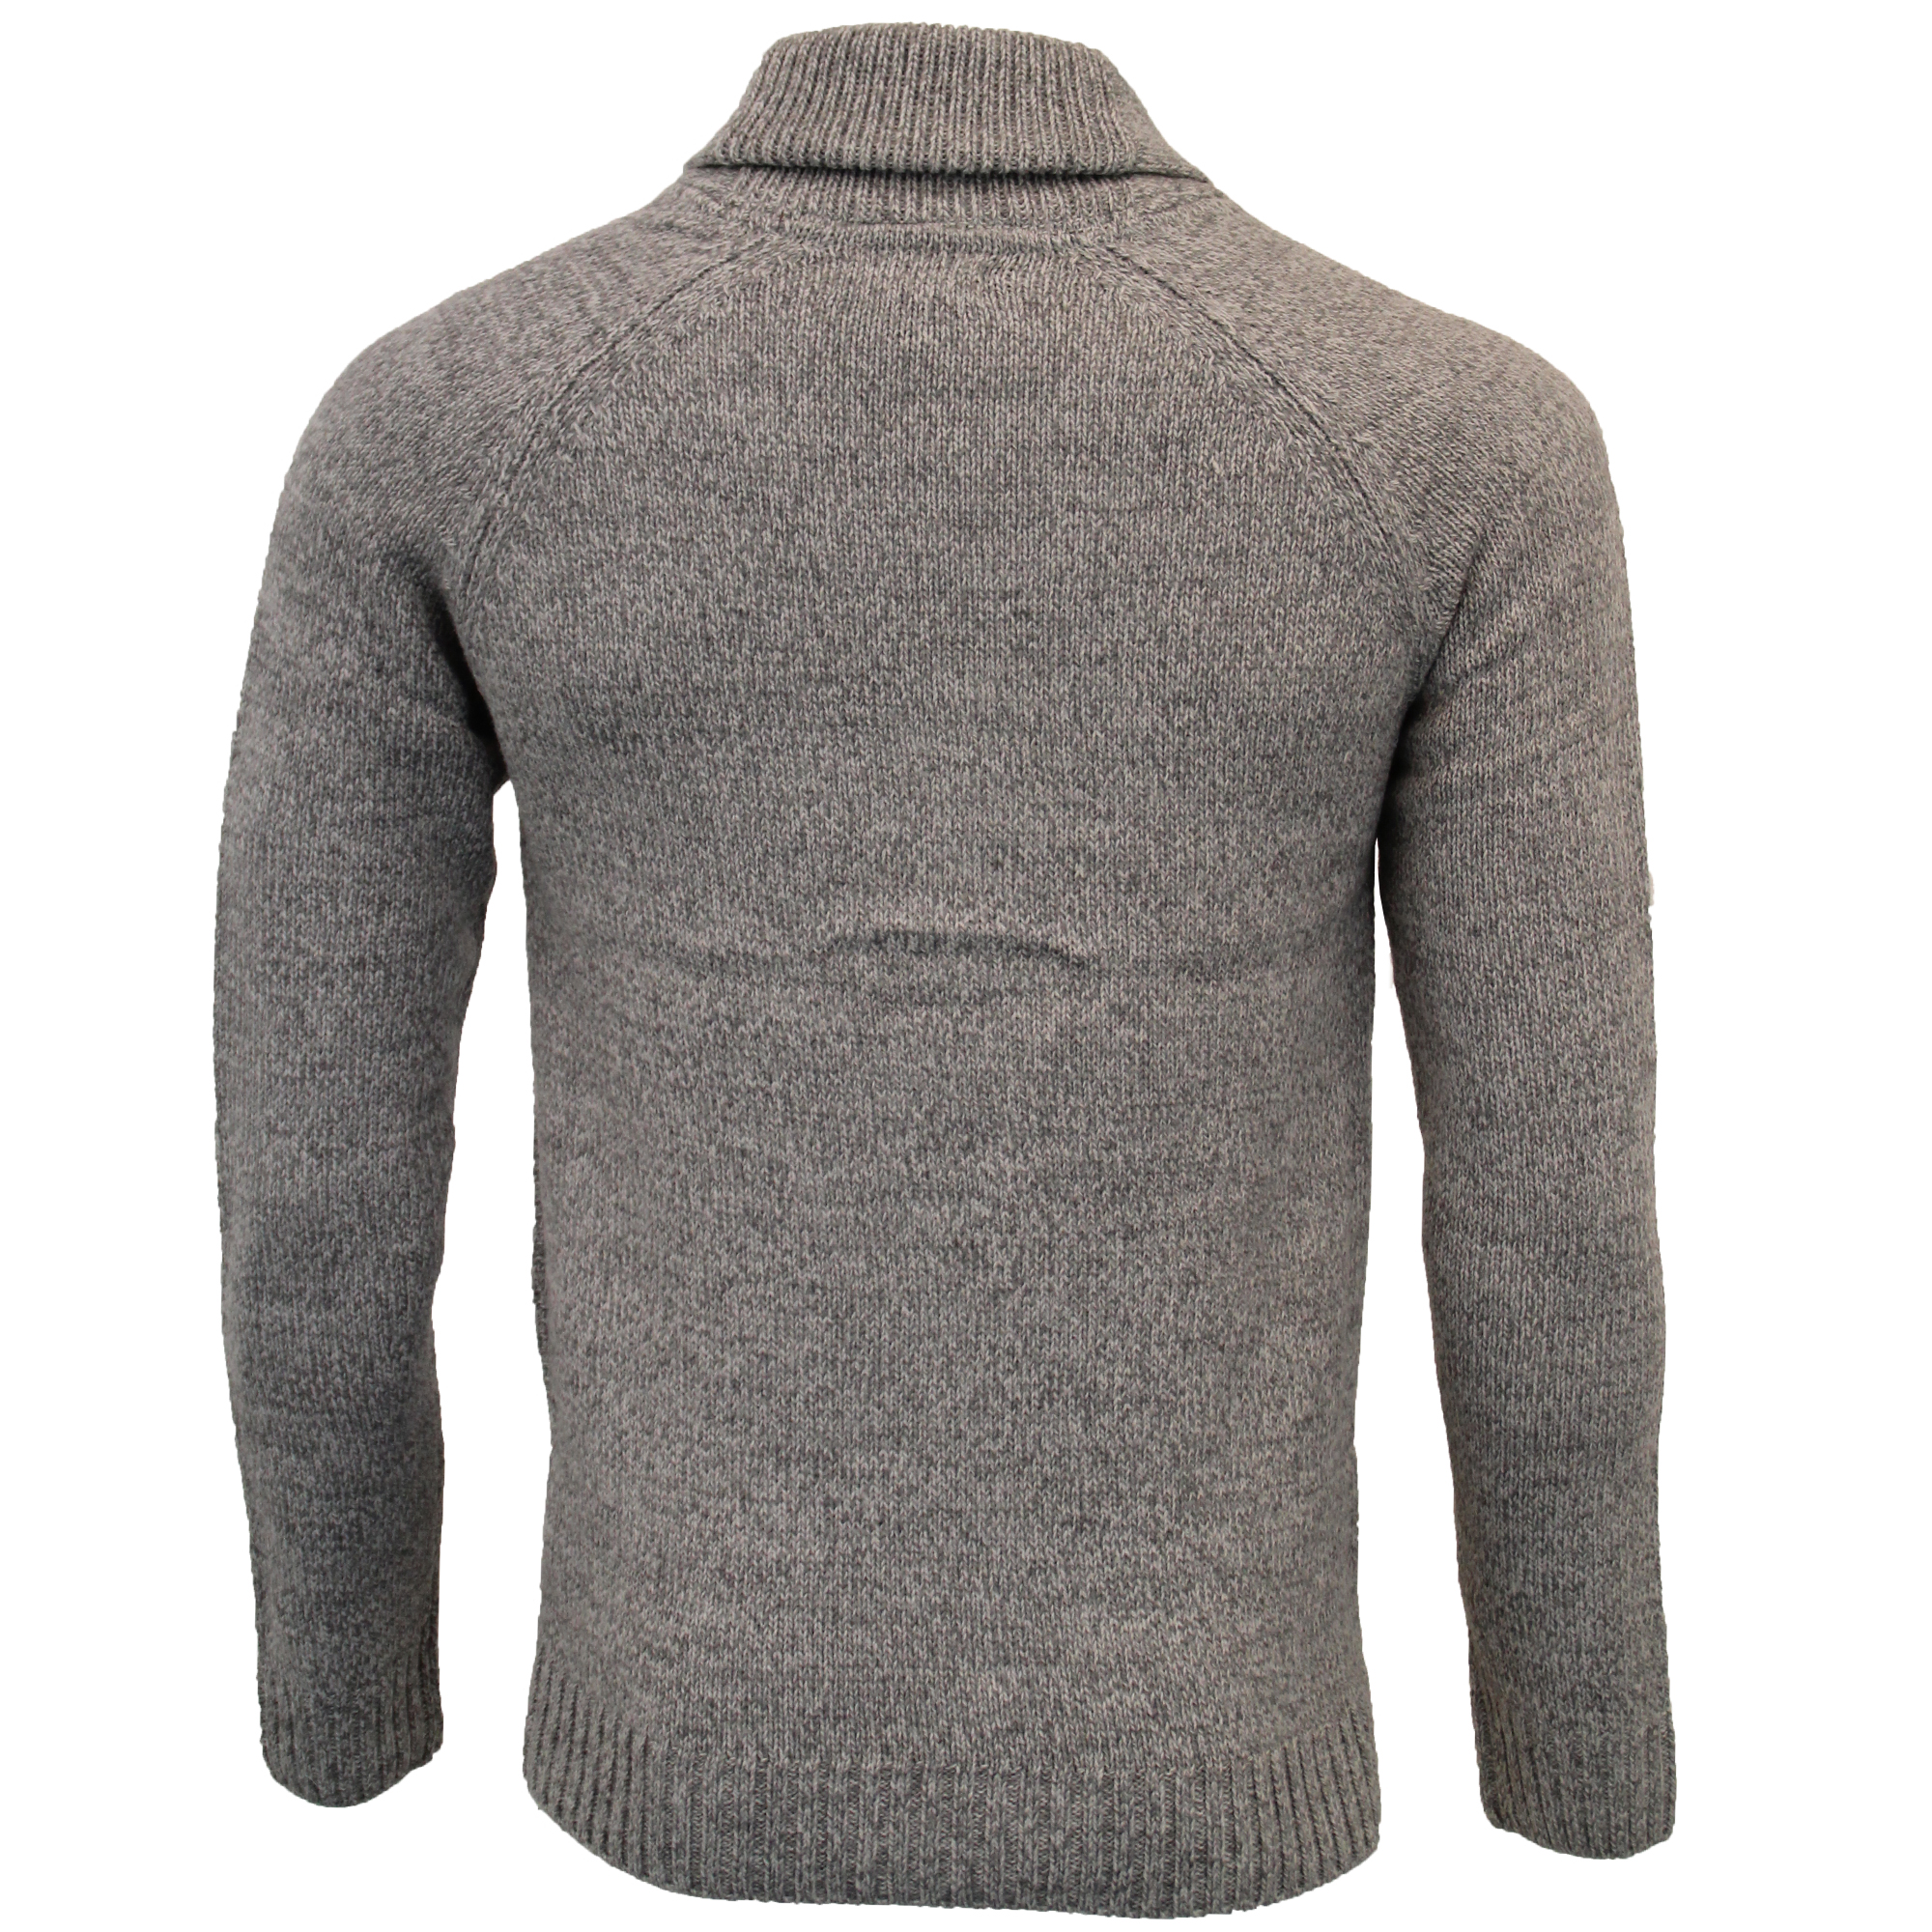 Mens-Wool-Mix-Cardigans-Threadbare-Knitted-Sweater-Broken-Standard-Shawl-Winter thumbnail 12